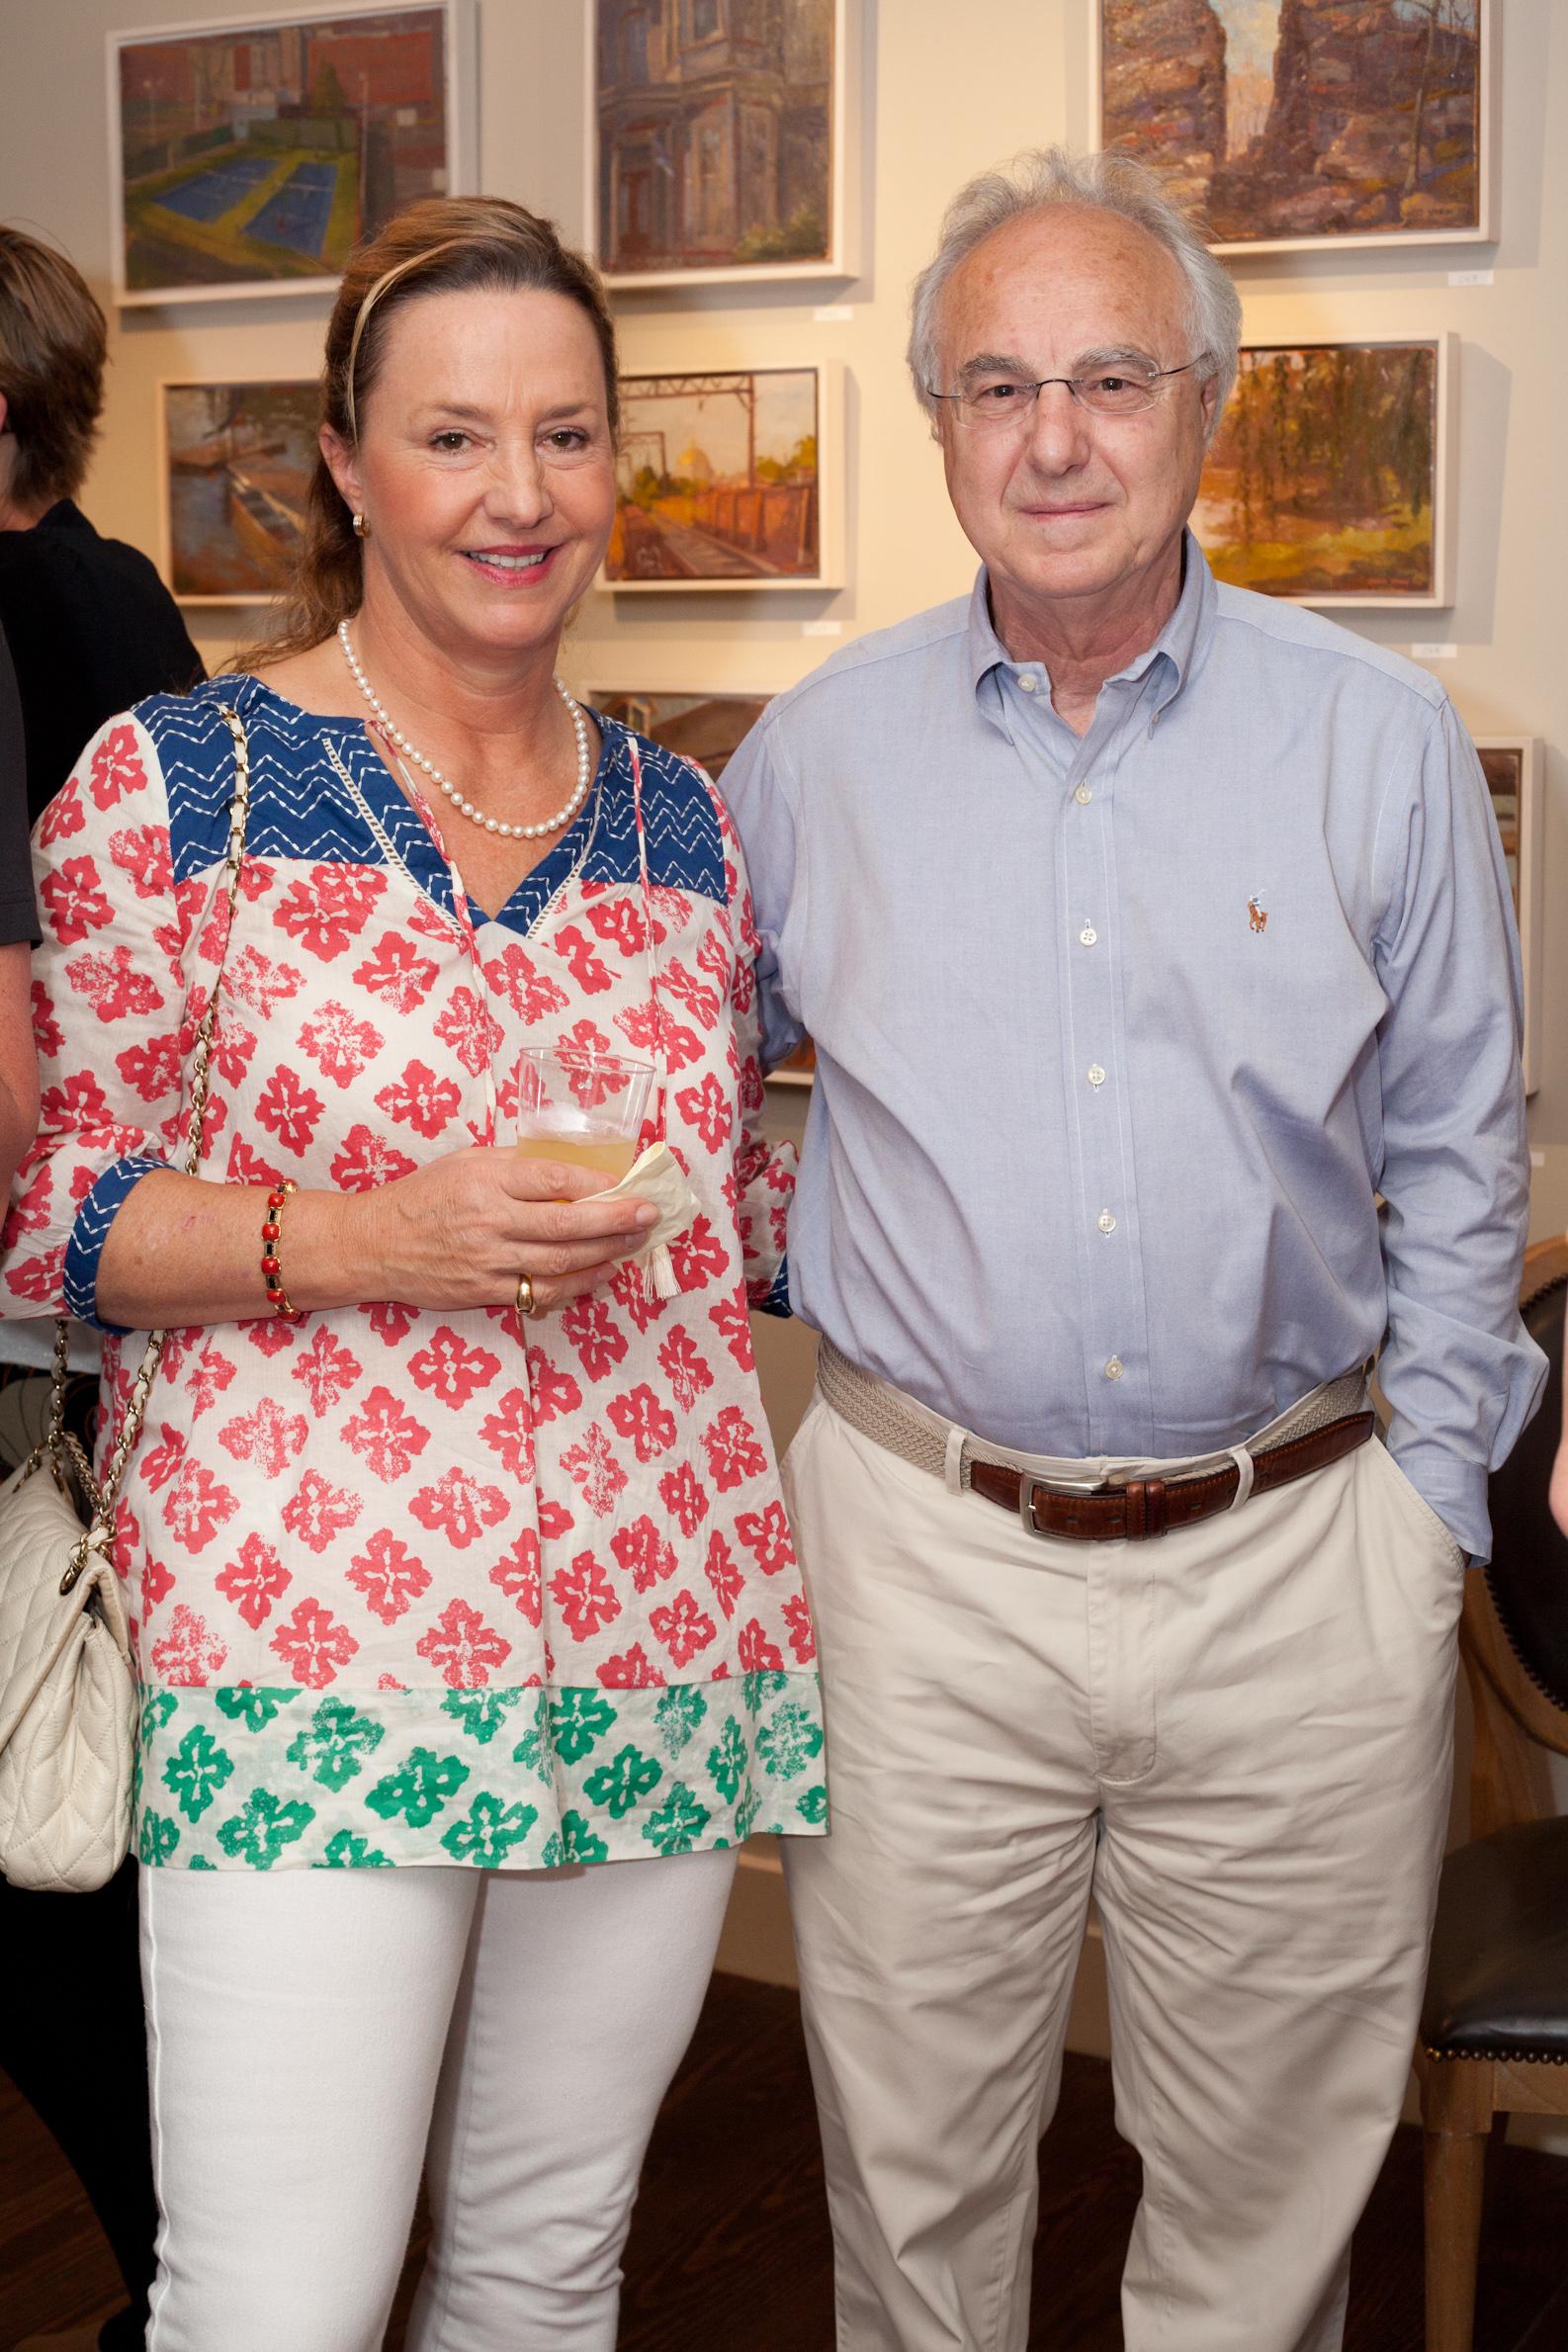 IMG_9721 Petra Peters and Kostas Brillis.jpg